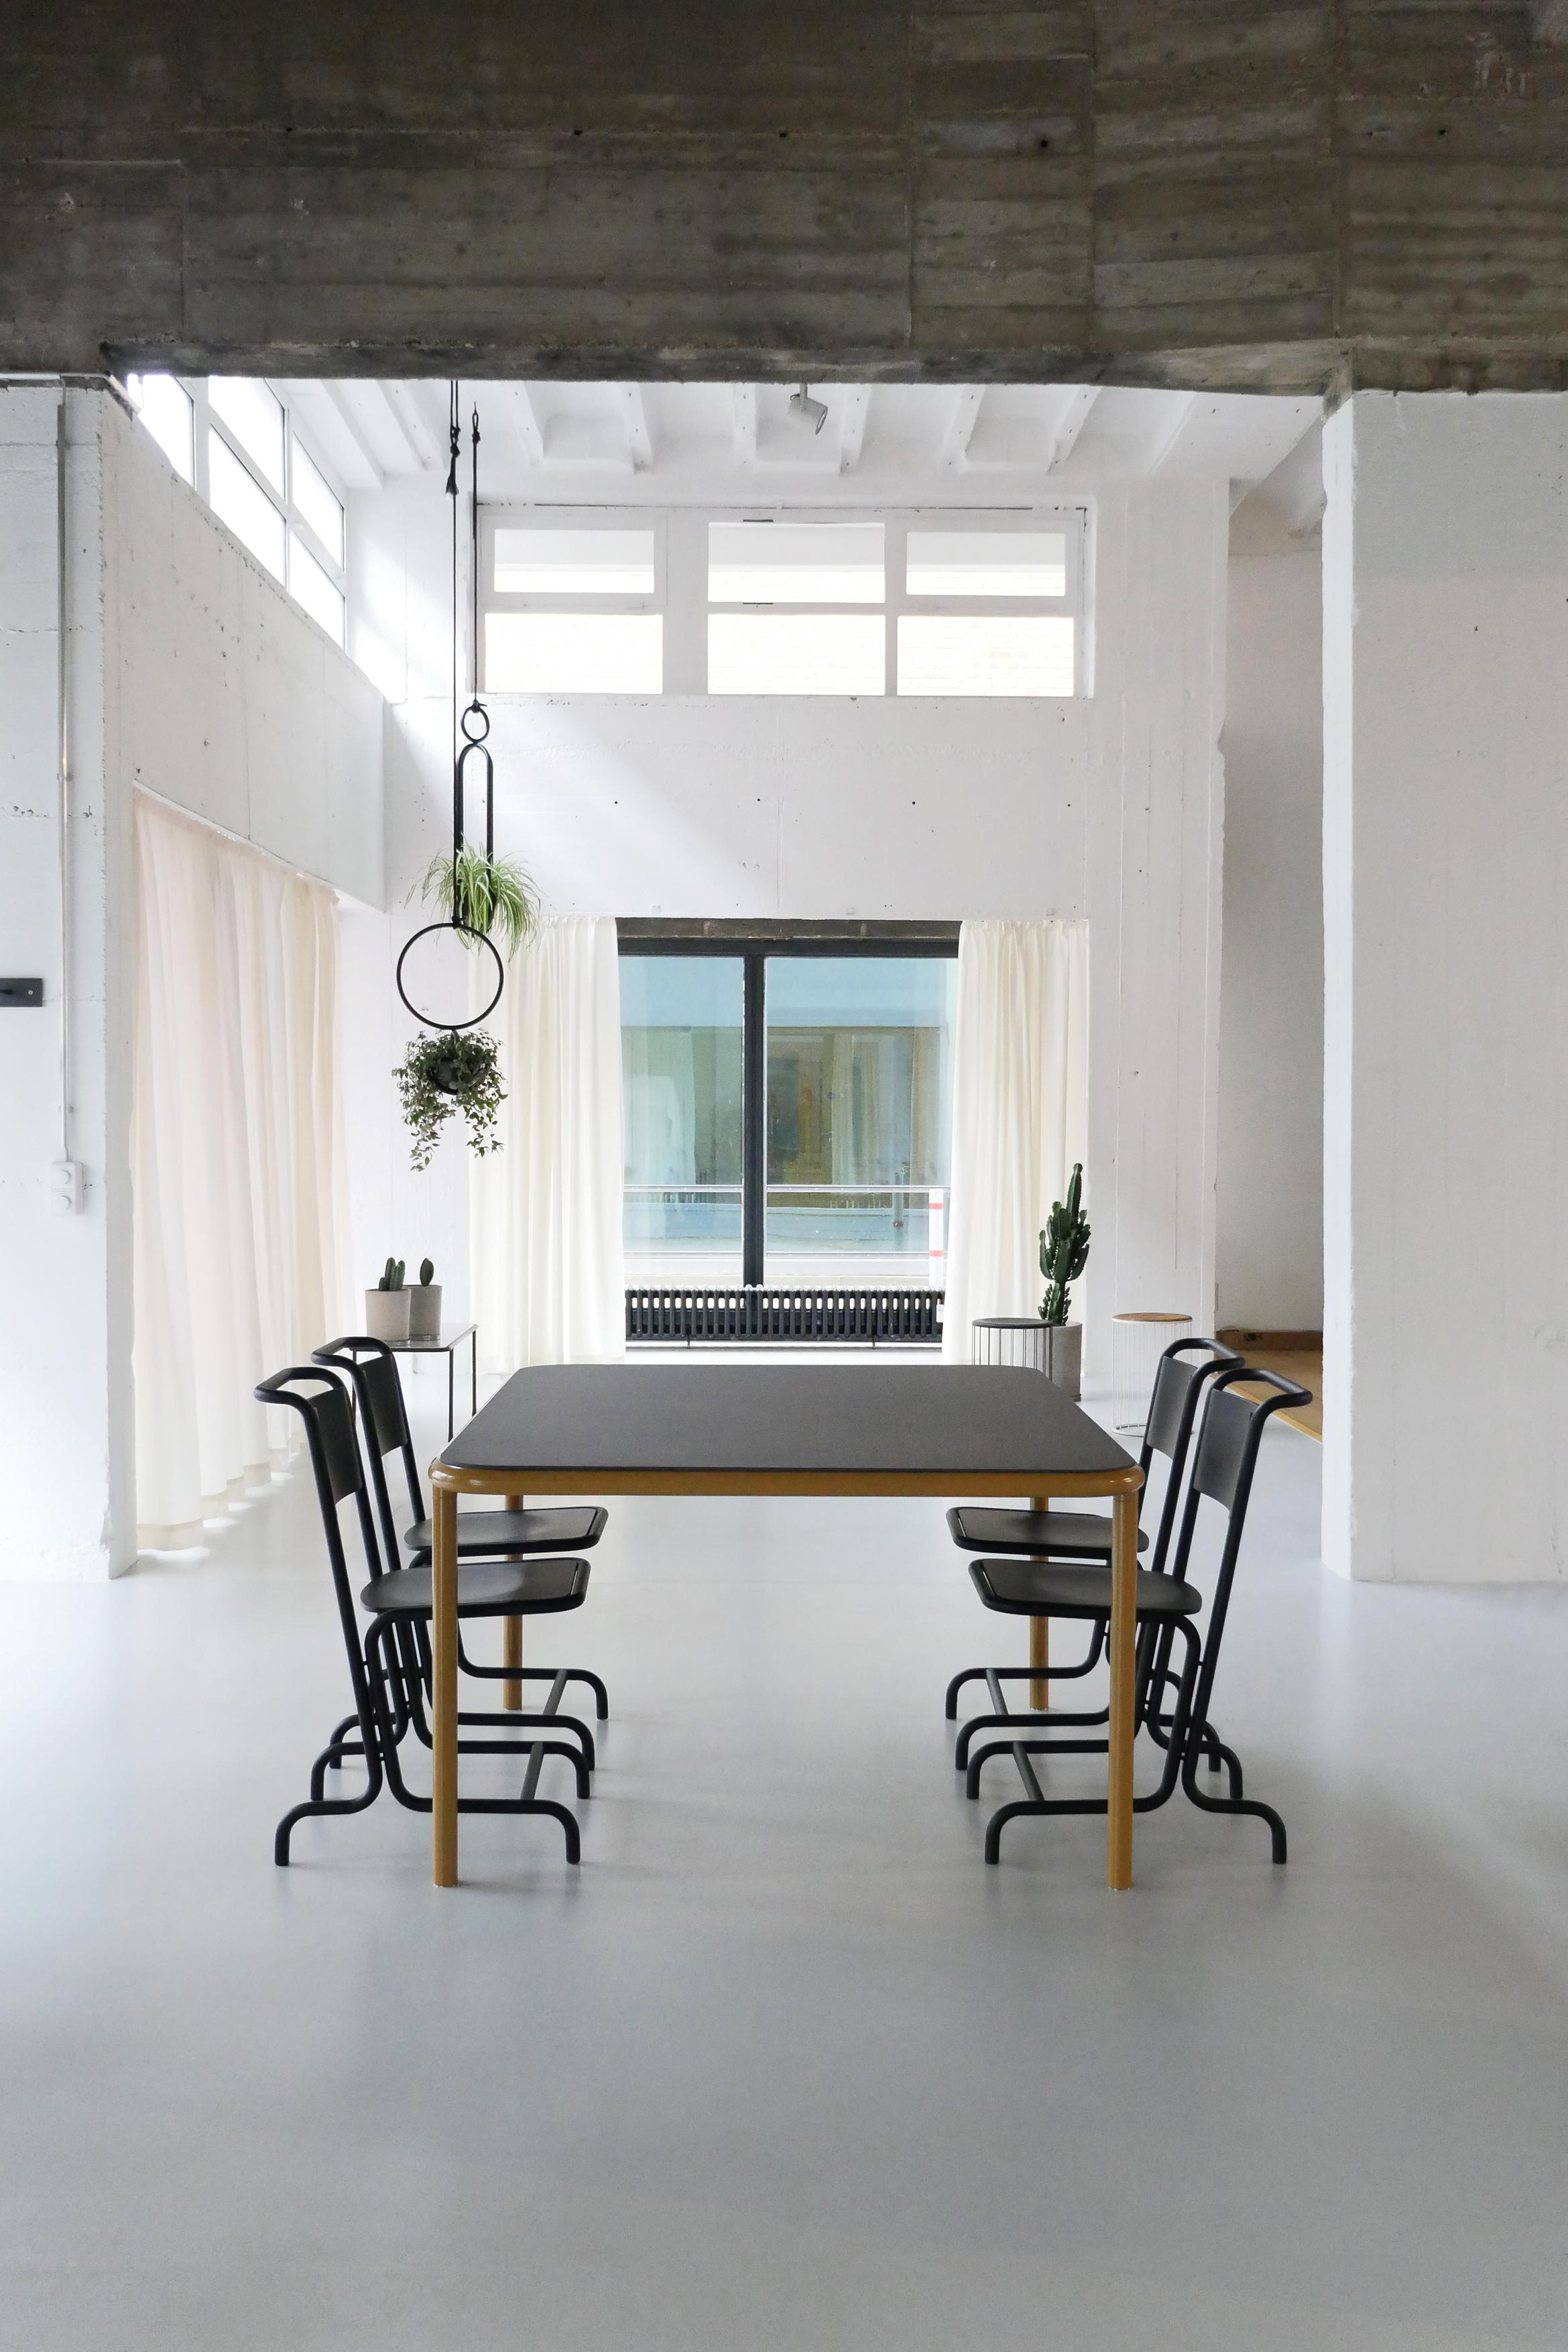 Bologna Stahl Tisch Laszlo Stuhl Atelier Haußmann